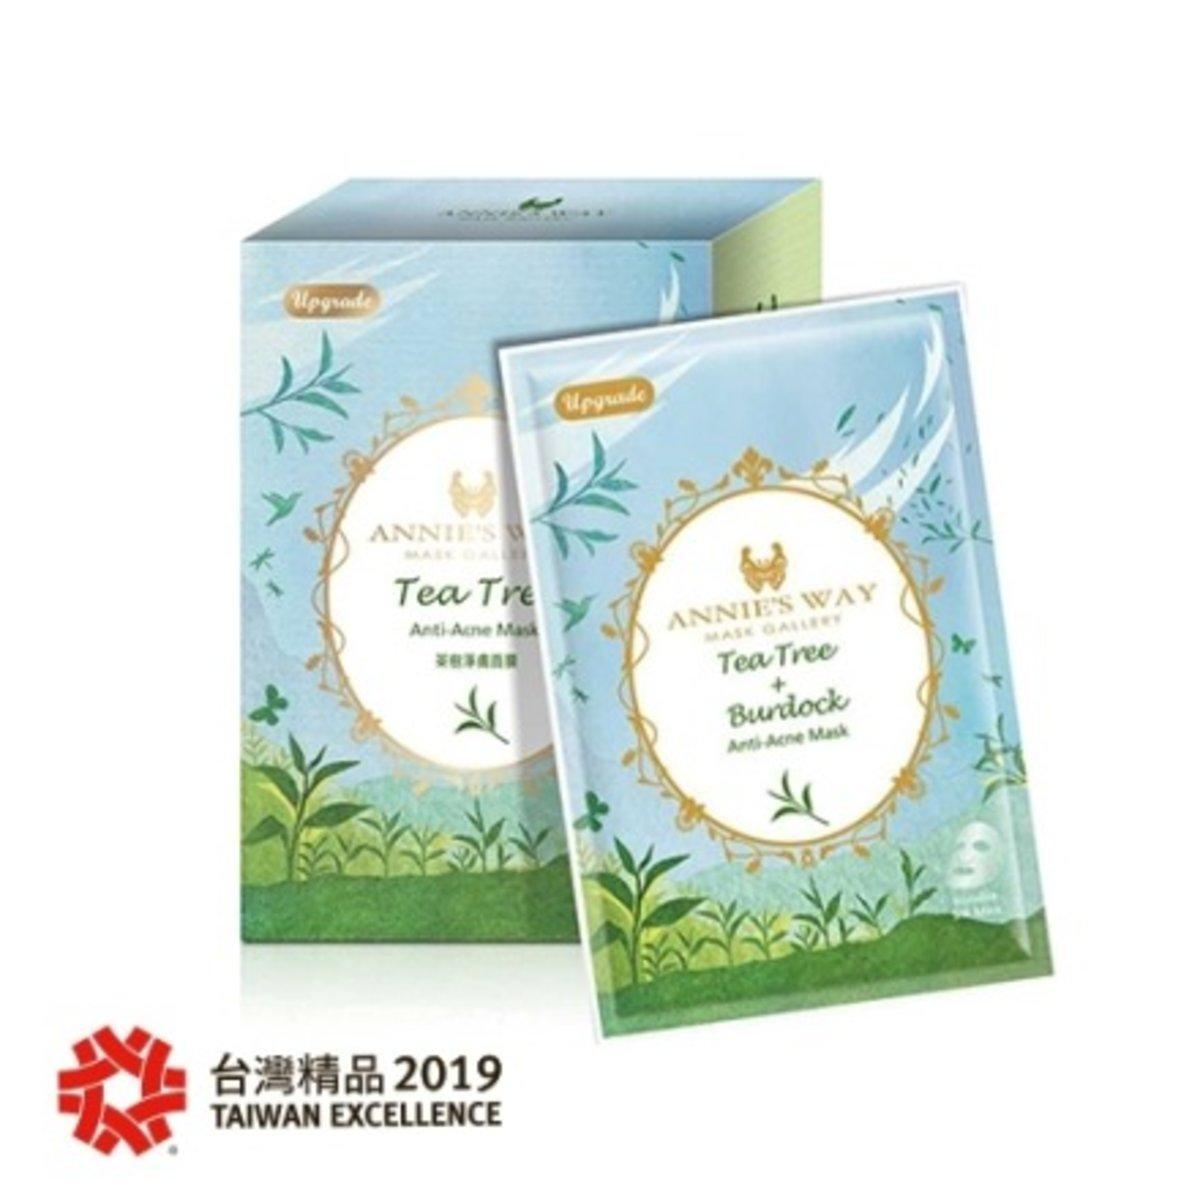 Tea Tree + Burdock Anti Acne Mask